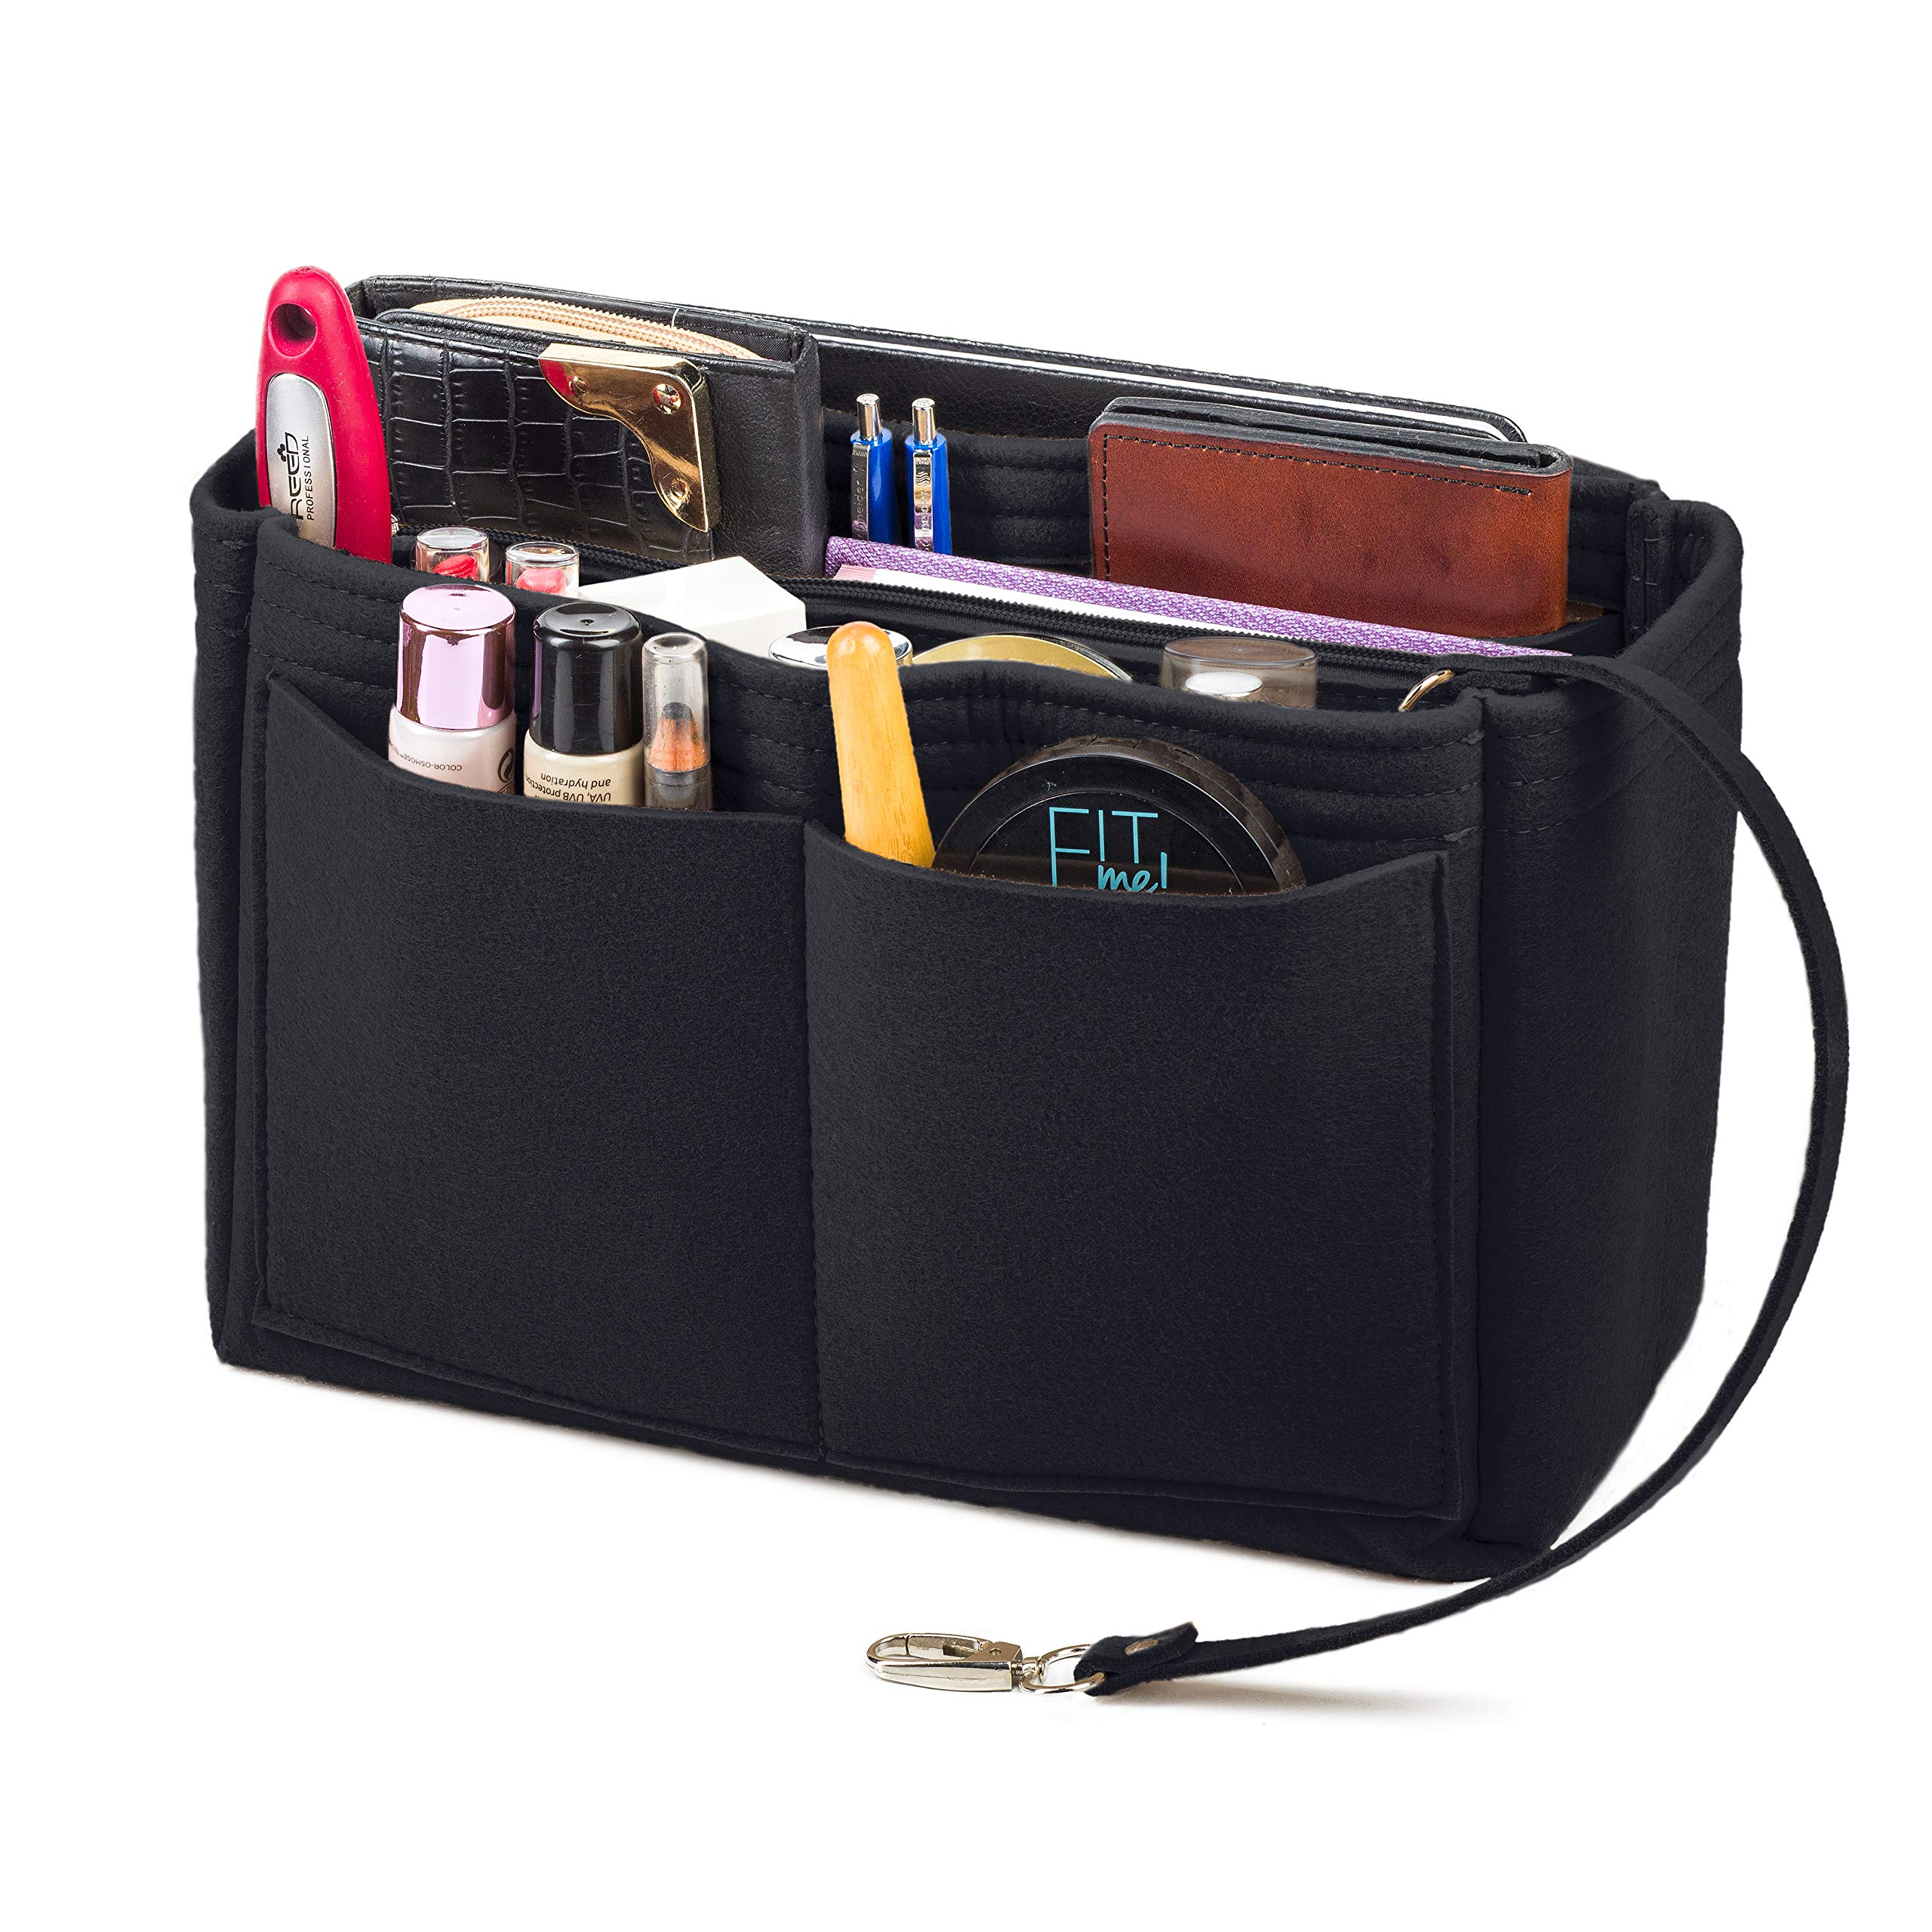 Purse Organizer Insert, Felt Bag Organizer with Zipper on Removable Handbag, Fits LV Speedy, Neverfull, Longchamp, Tote (XL, Black) by Lenox Trading Company